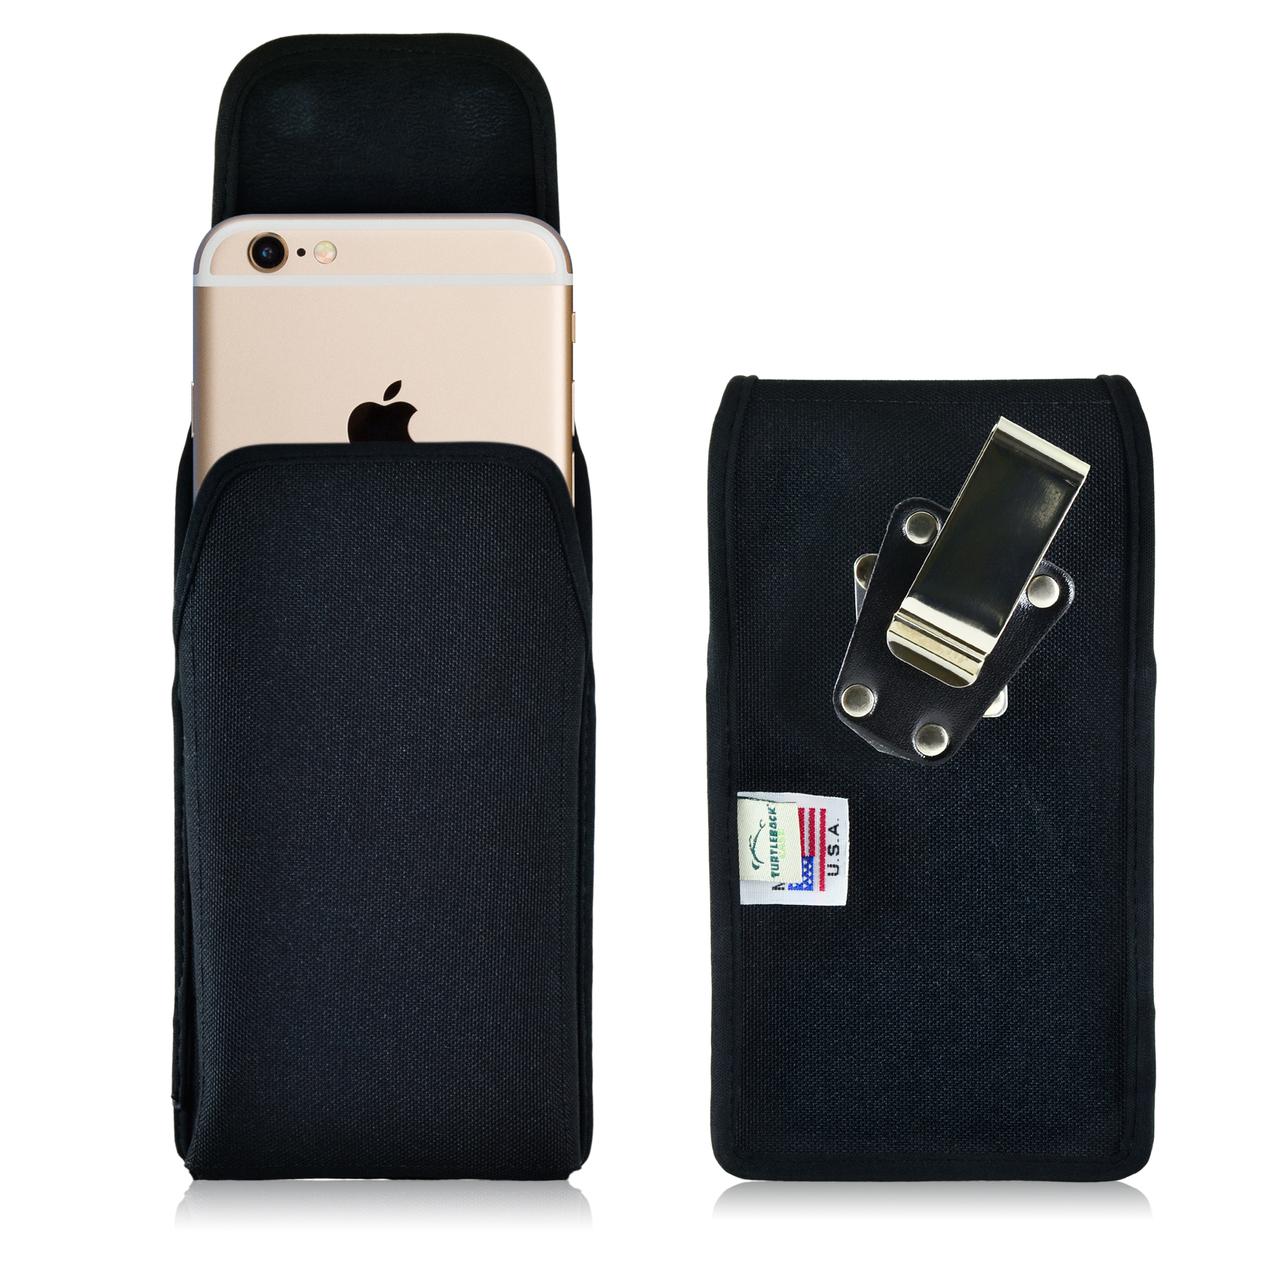 new product d2c89 e3c3e iPhone 6 Plus/6S Plus Vertical Nylon Rotating Clip Holster